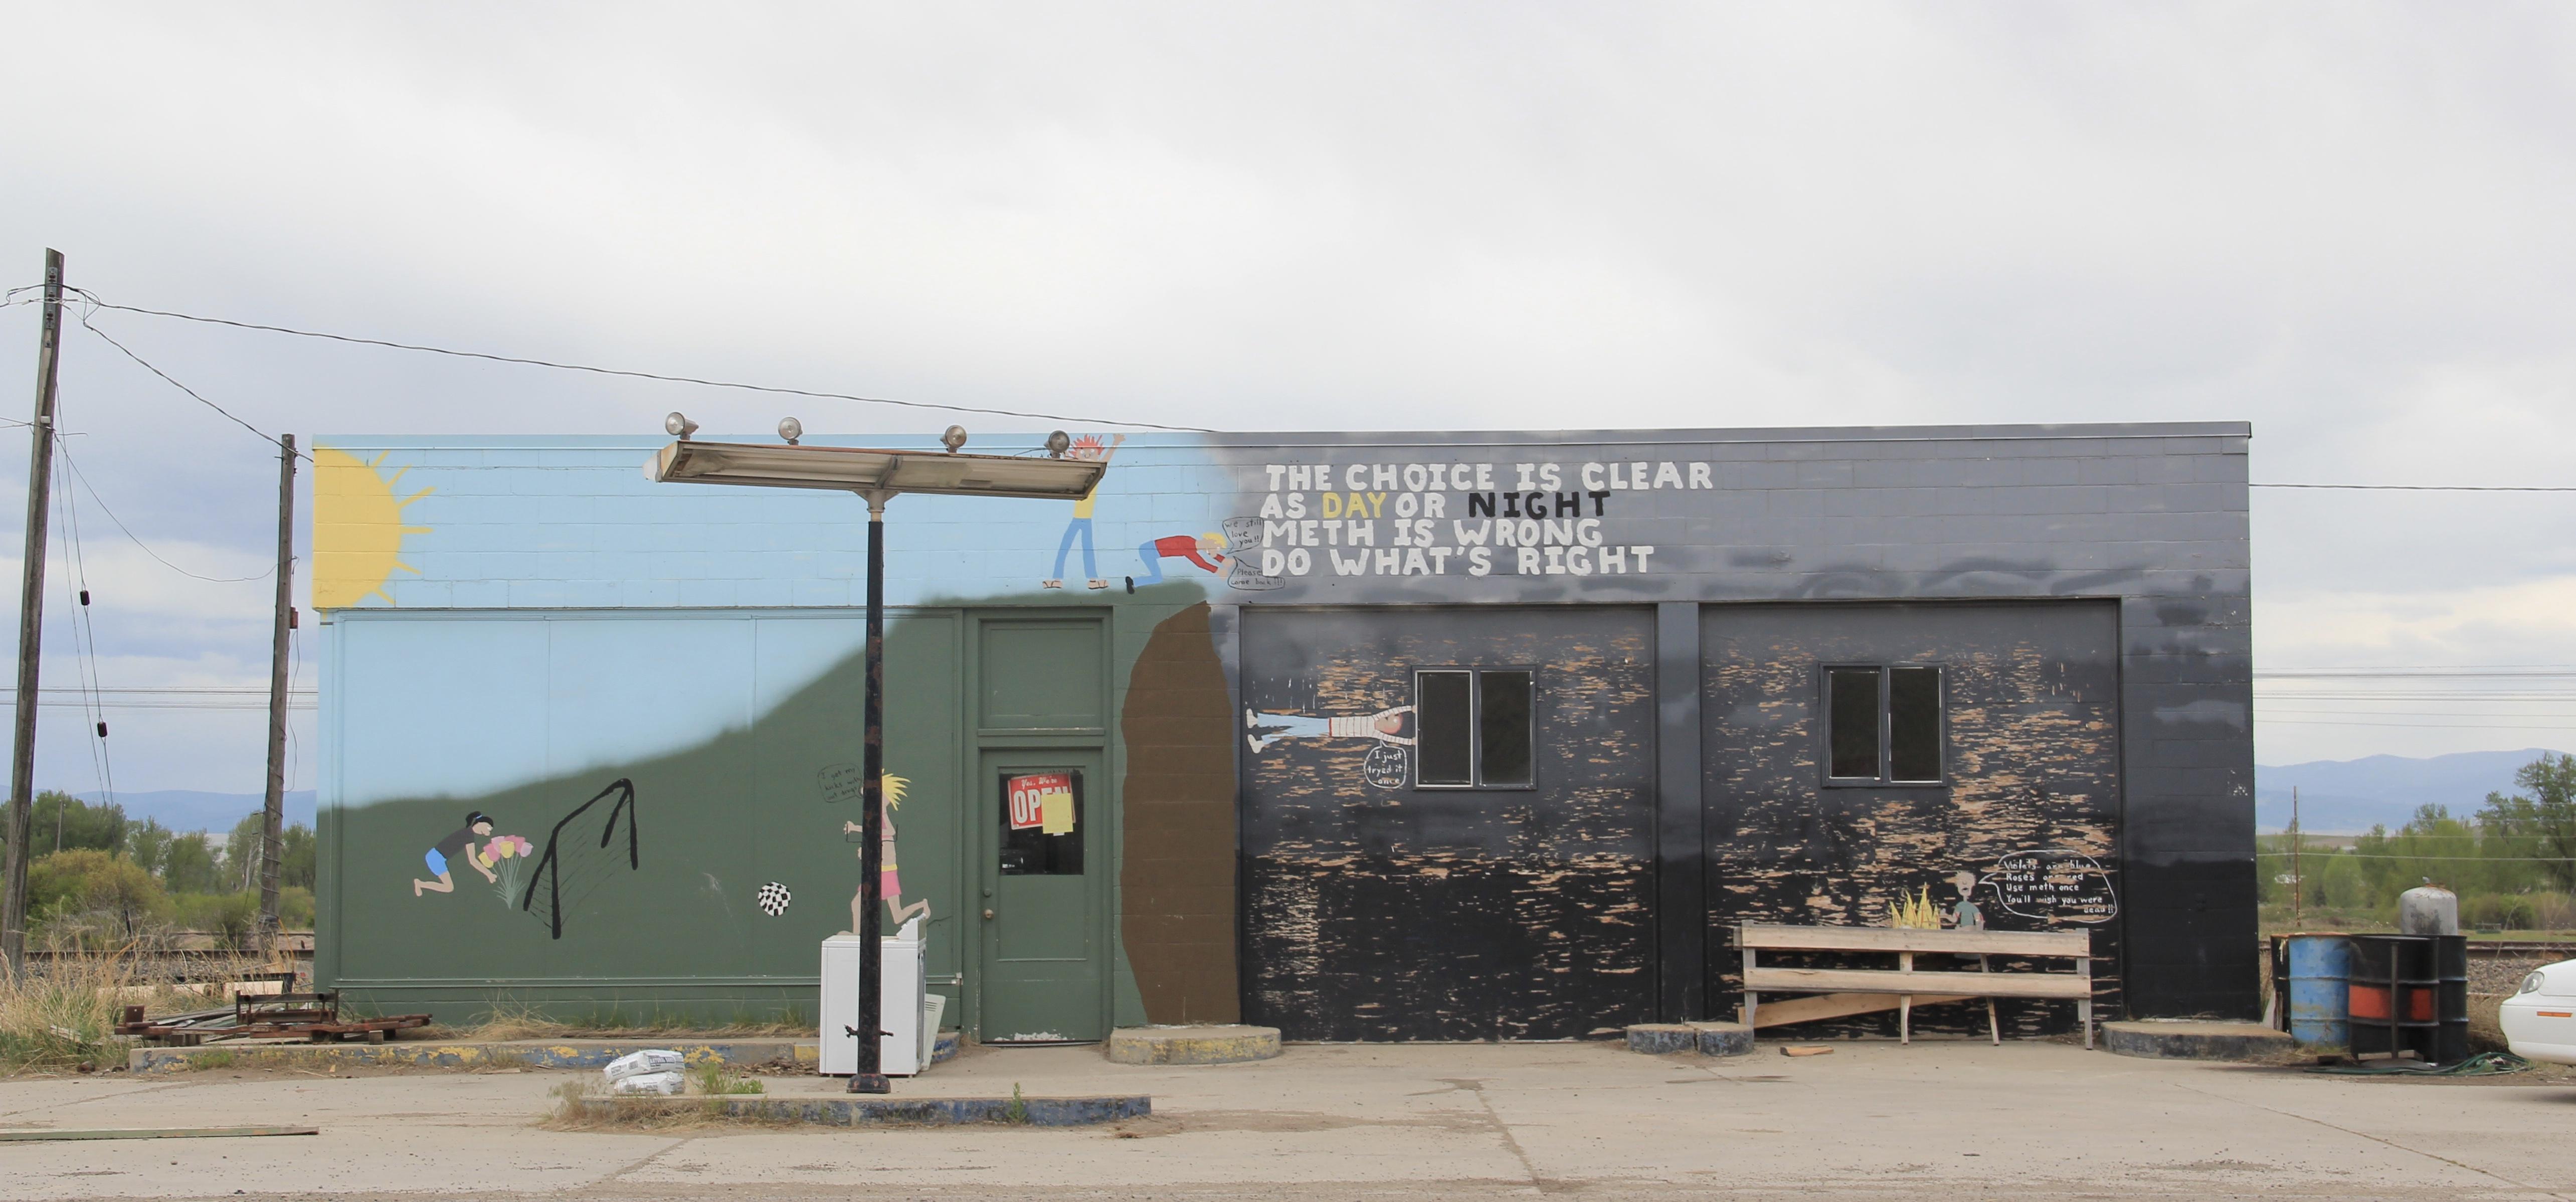 Granite Co, Drummond gas station, Front St, meth mural, roadside